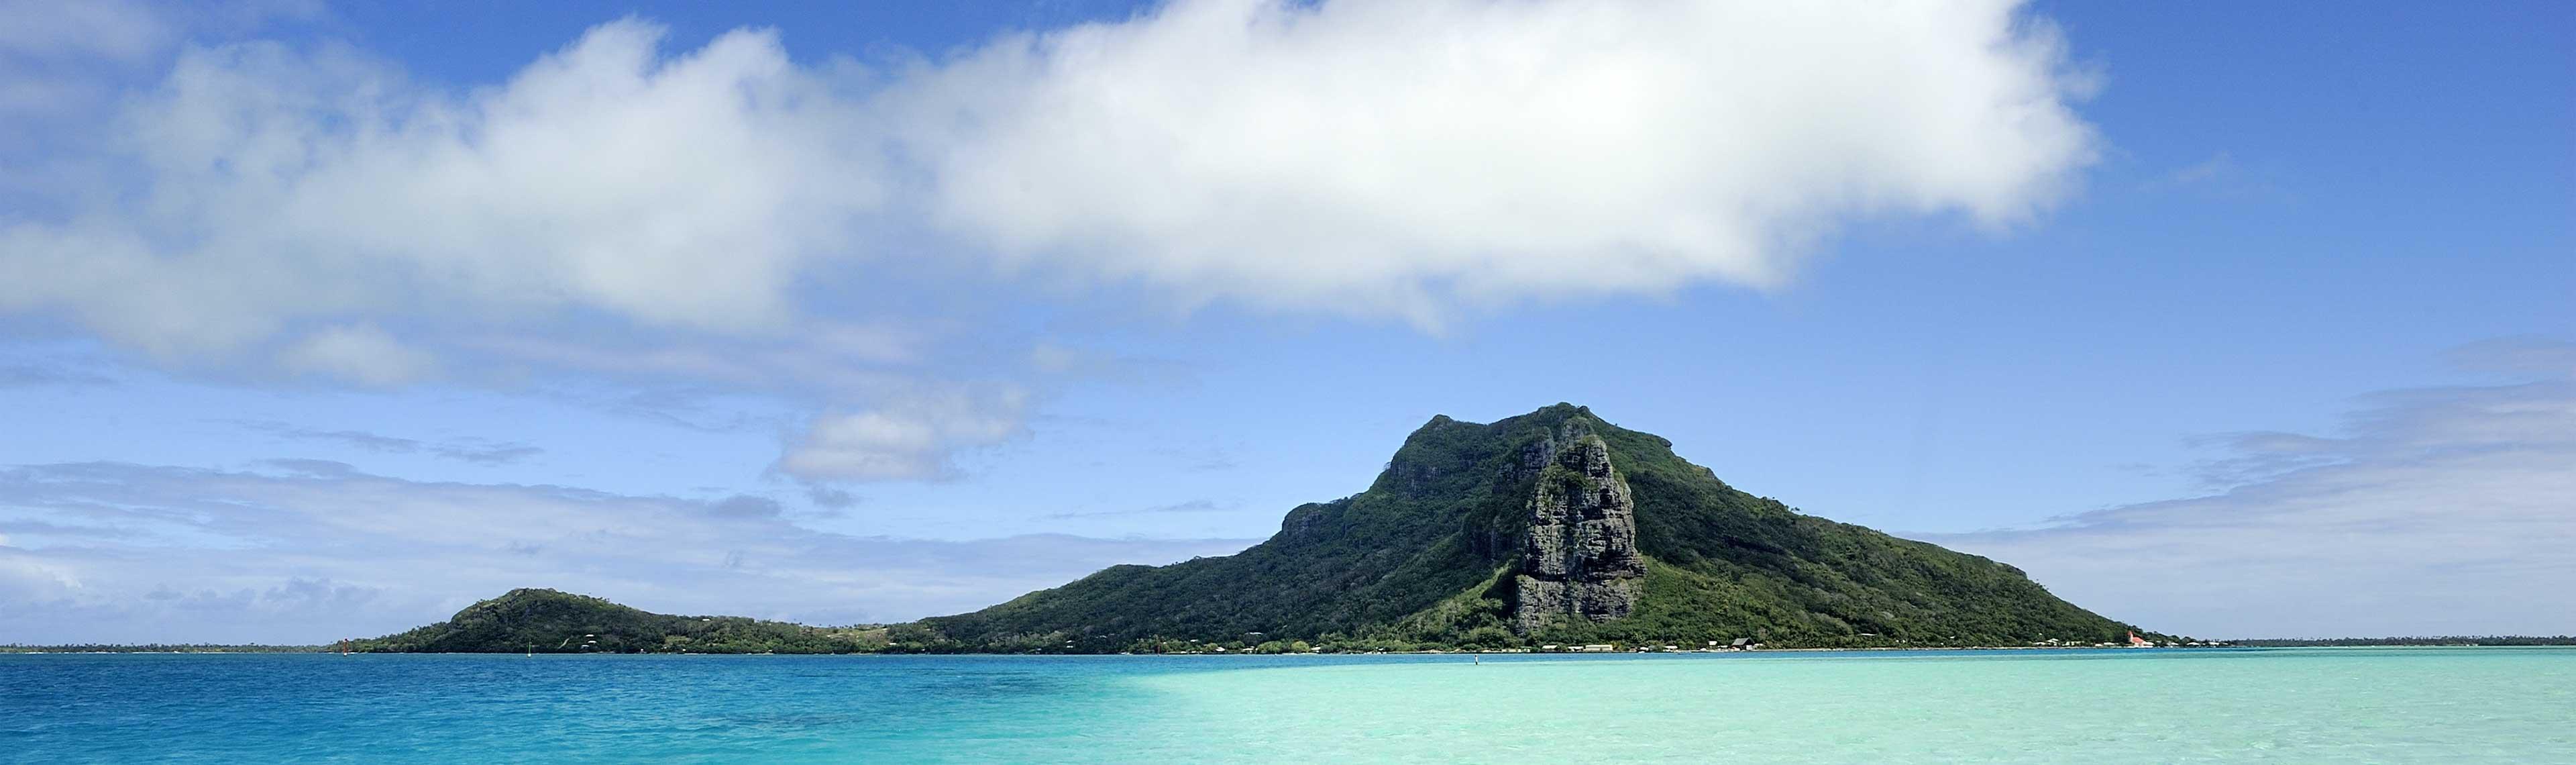 island of maupiti